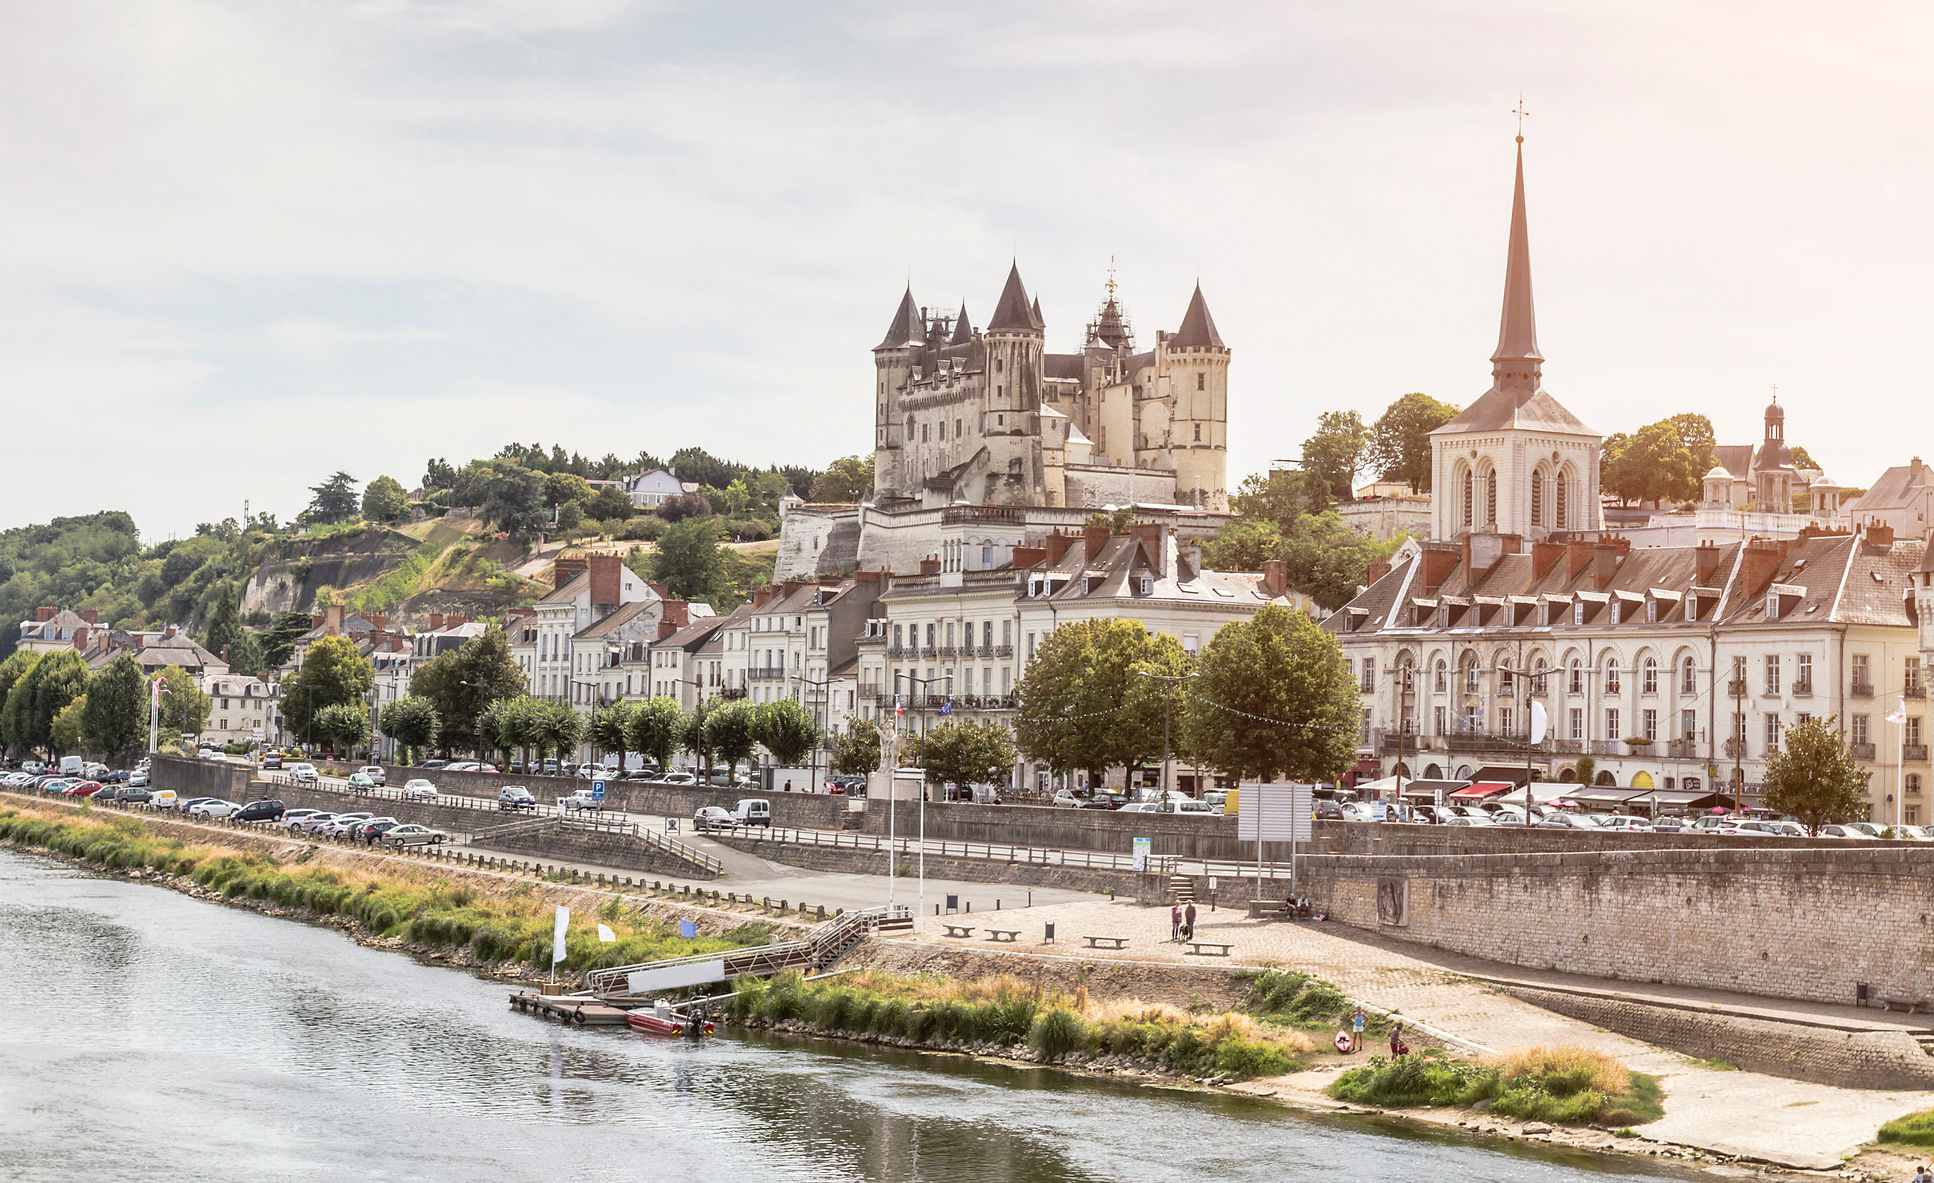 zámek Saumur | PJPhoto69/